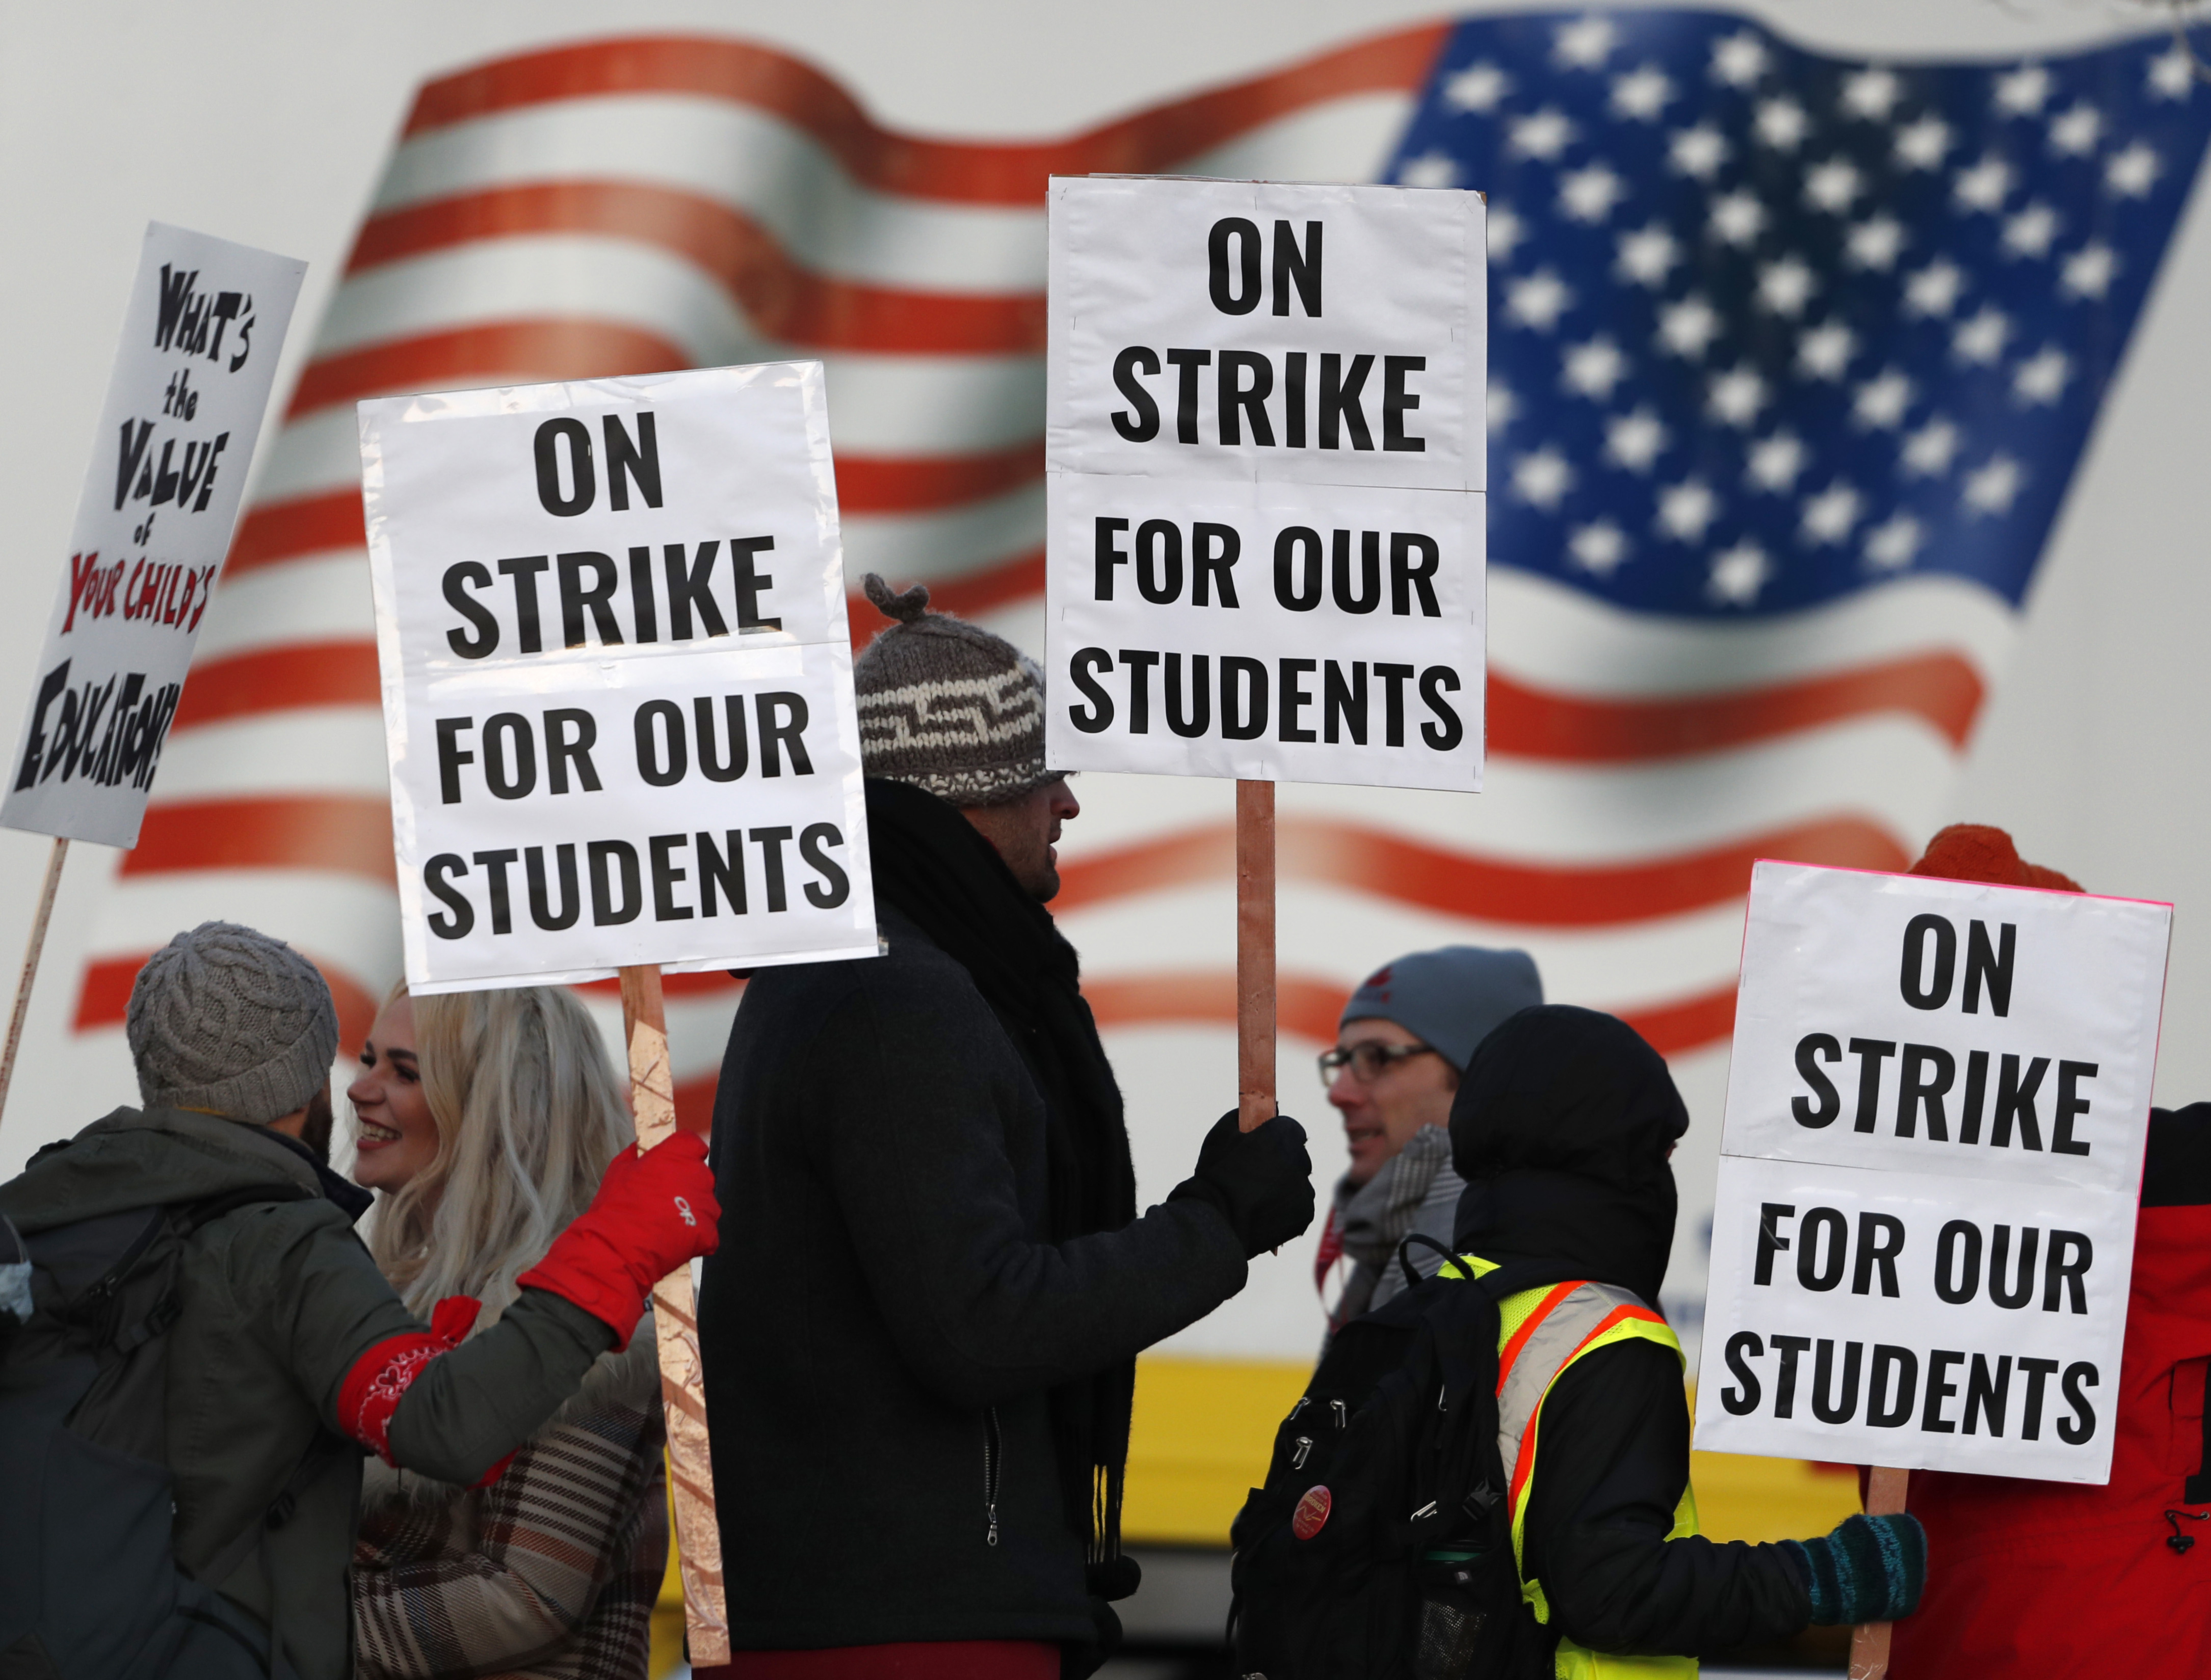 Oakland teachers announce strike over pay, class sizes